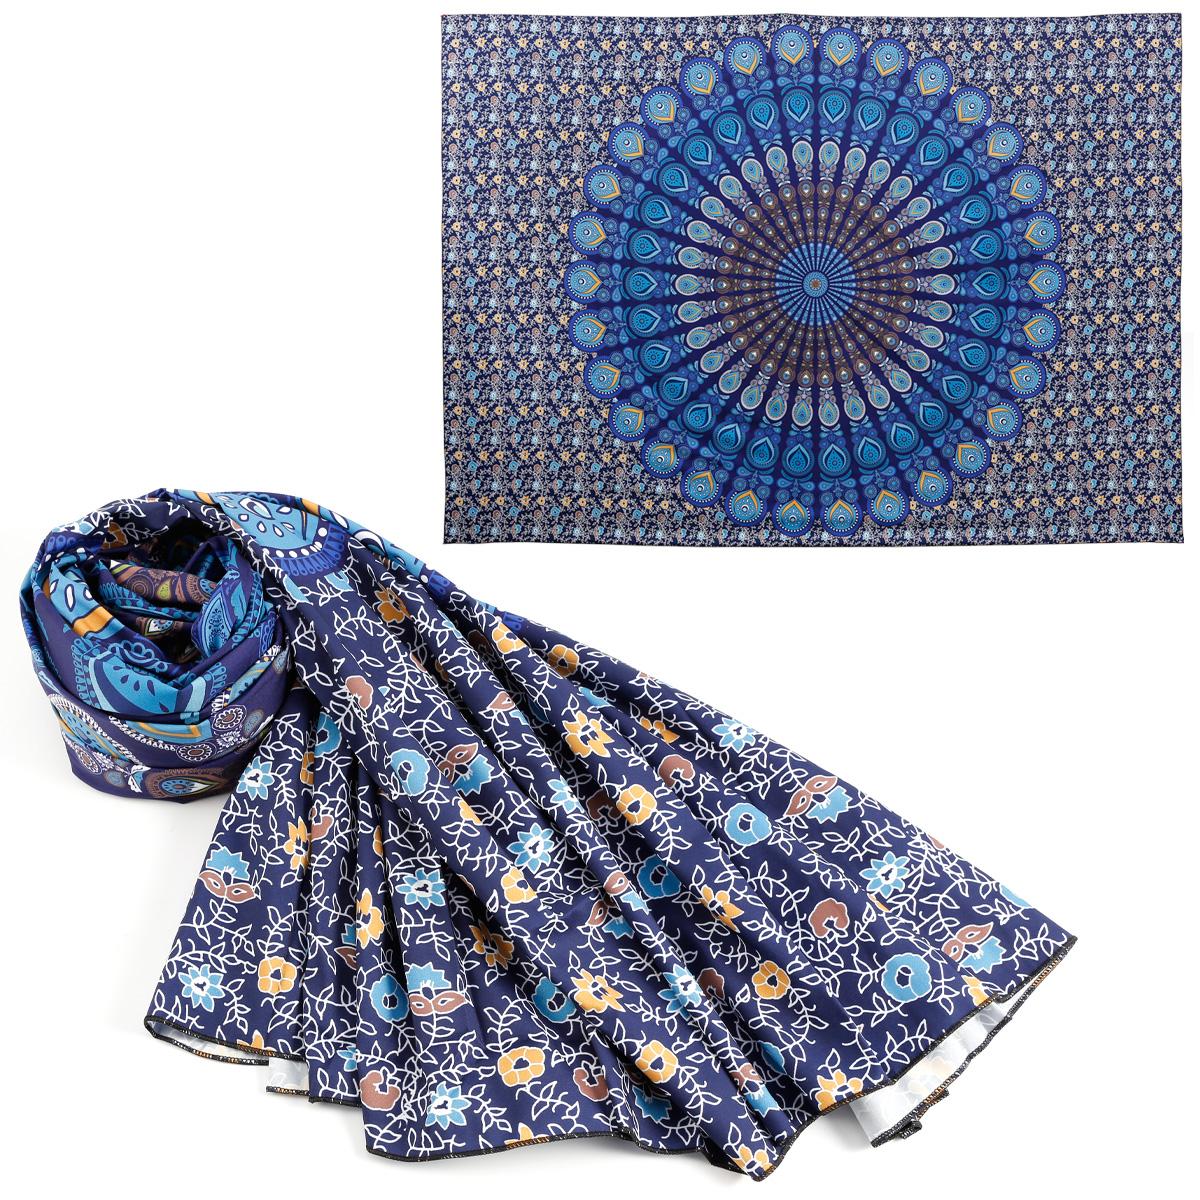 indisch mandala pfau design tagesdecke wandbehang dekotuch. Black Bedroom Furniture Sets. Home Design Ideas